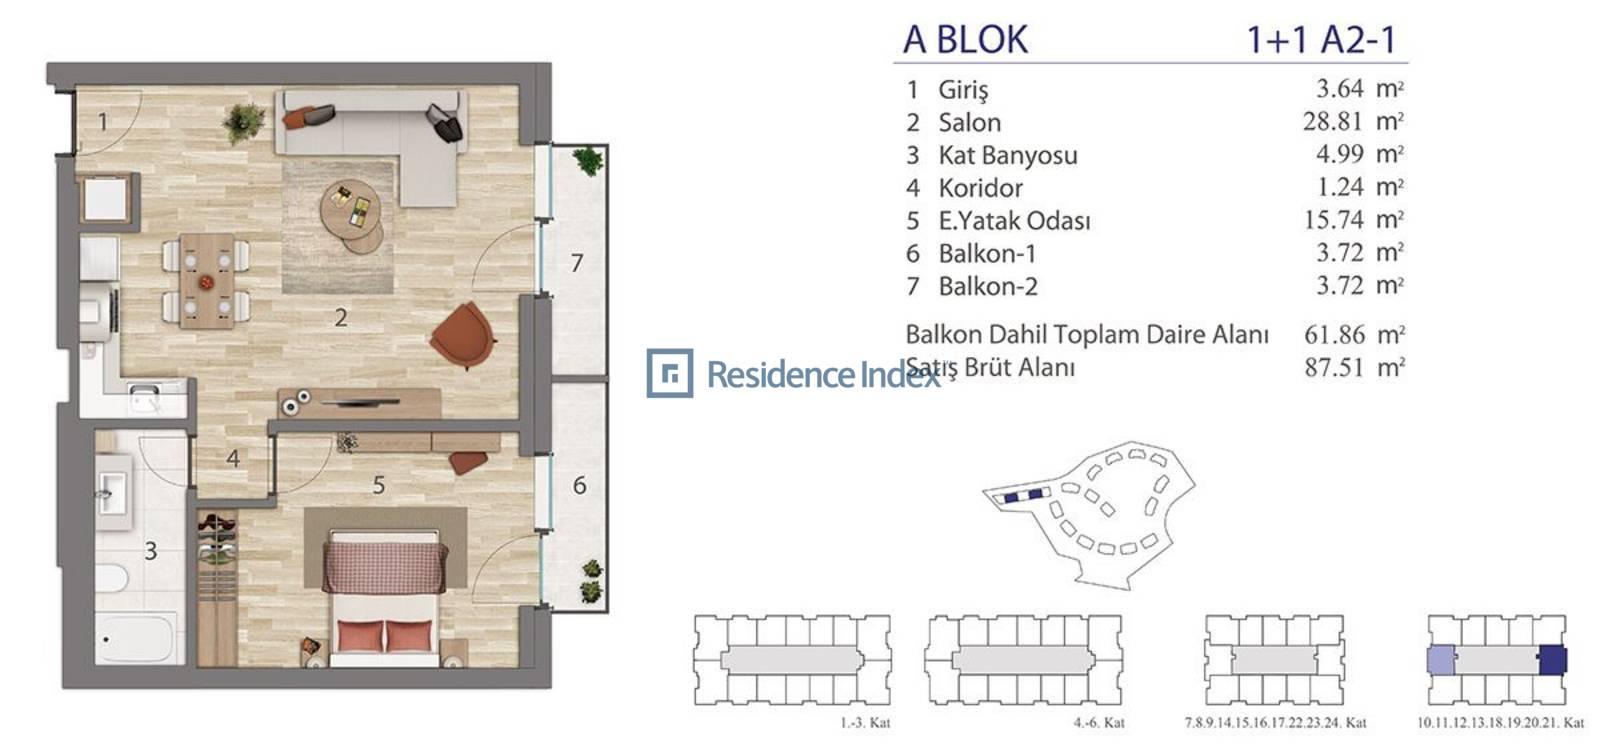 5.LEVENT A Blok A2-1